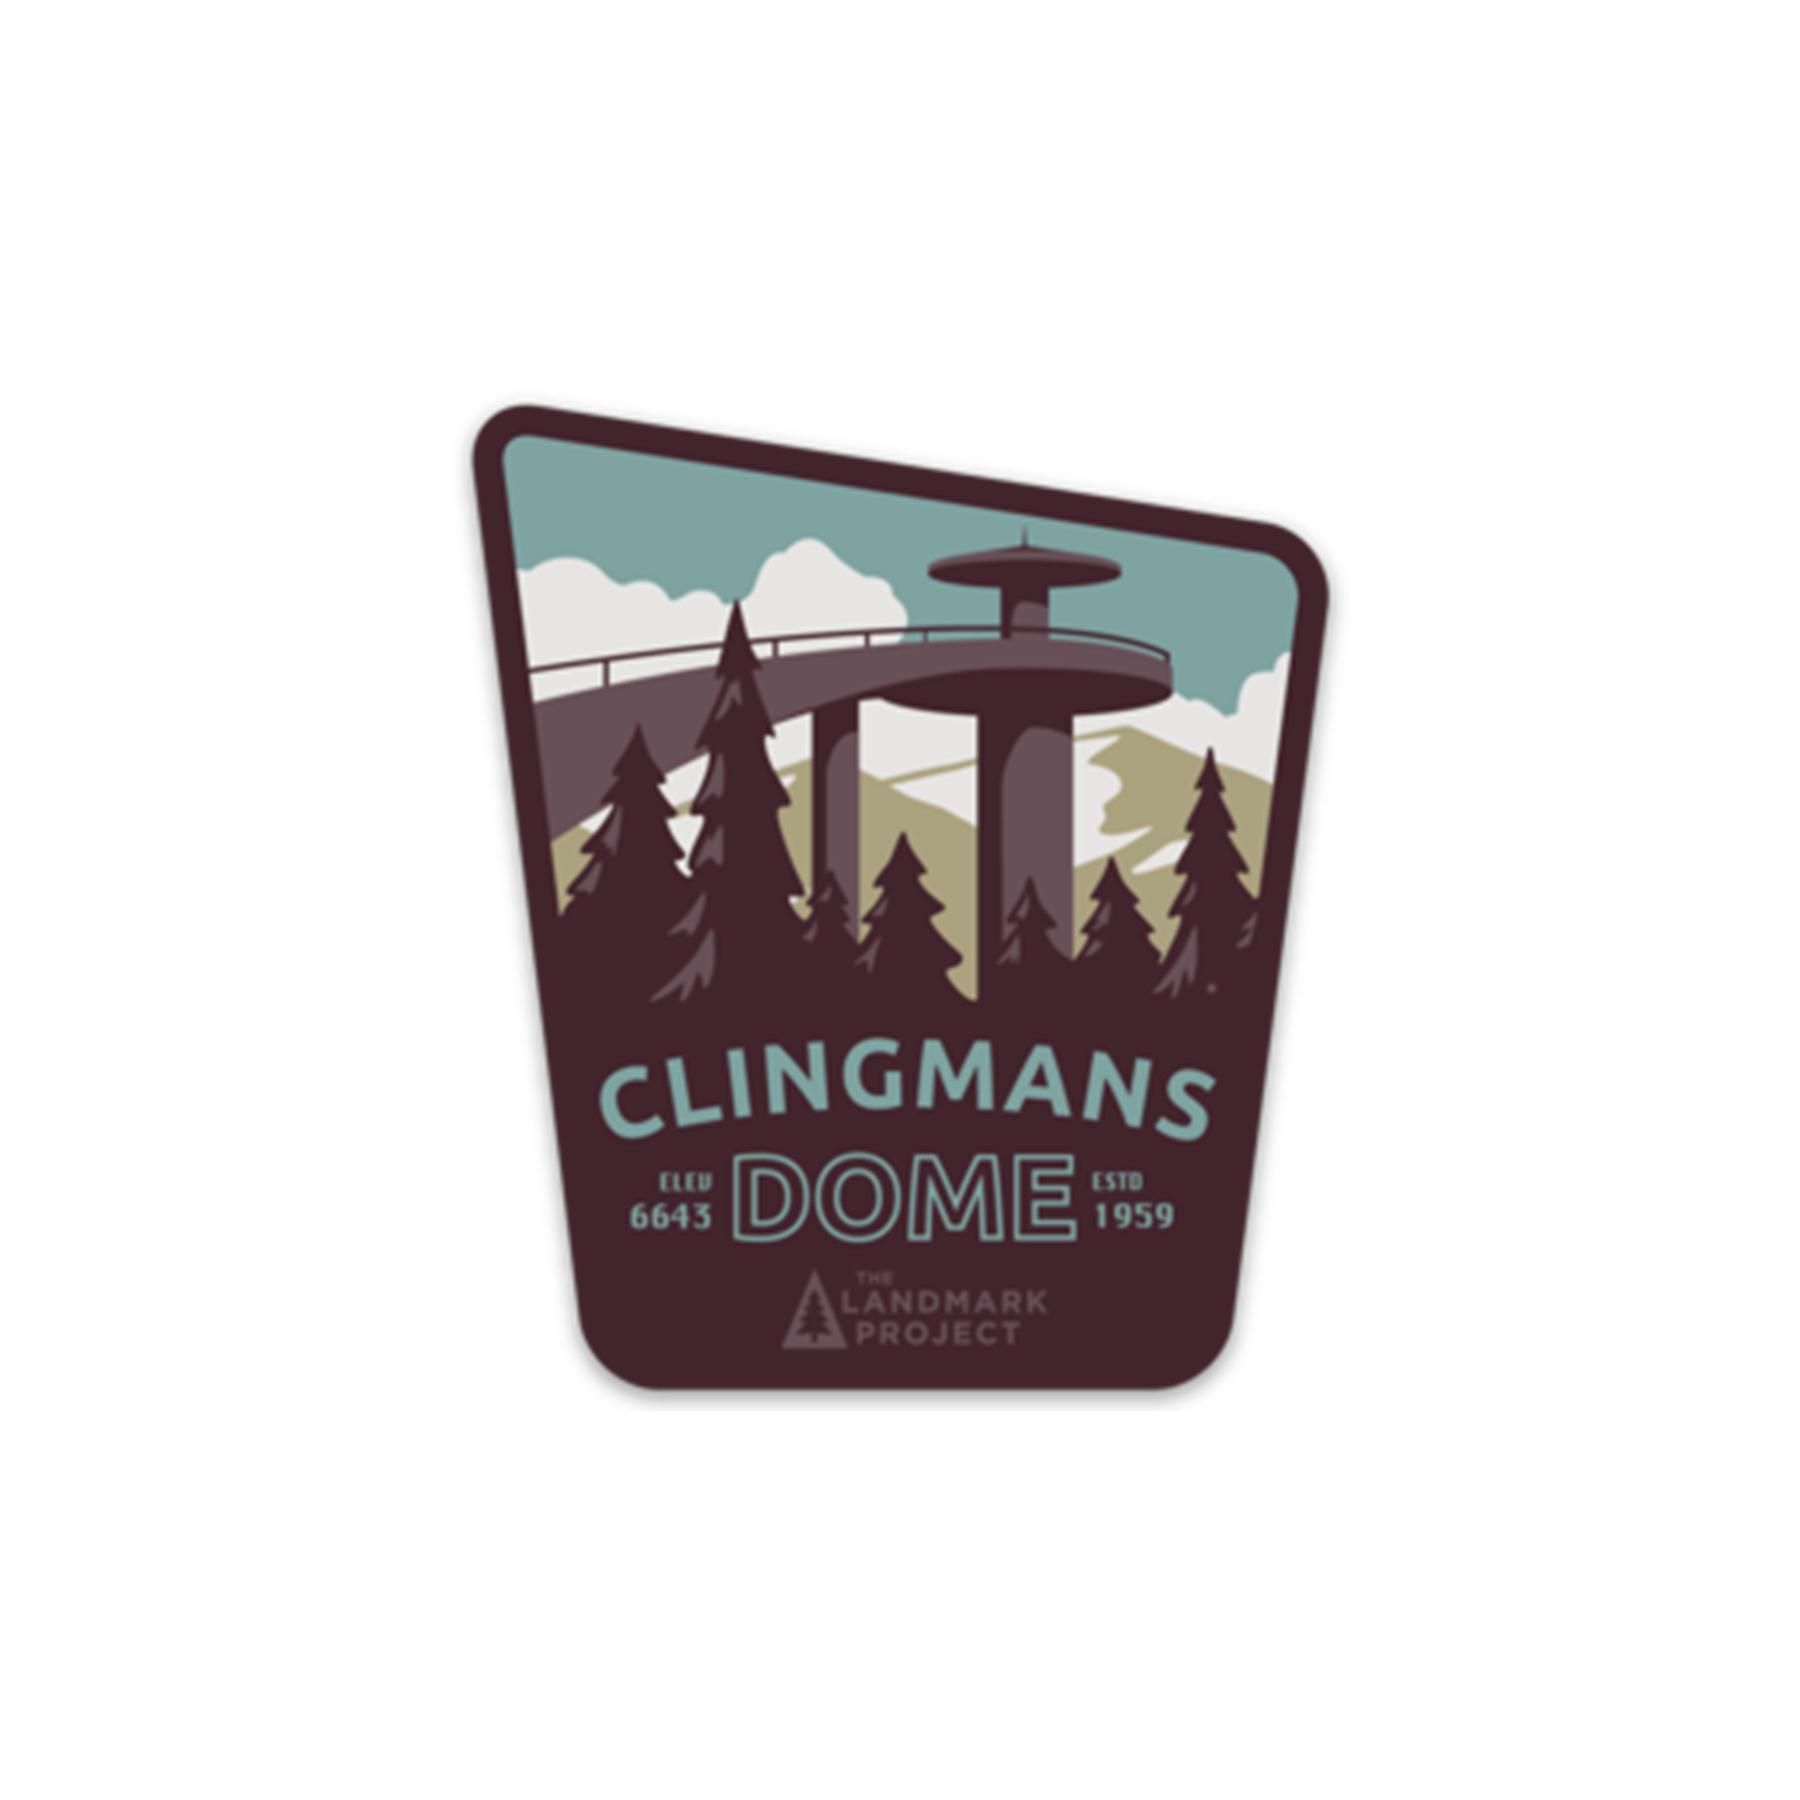 clingmans-dome-sticker.jpg